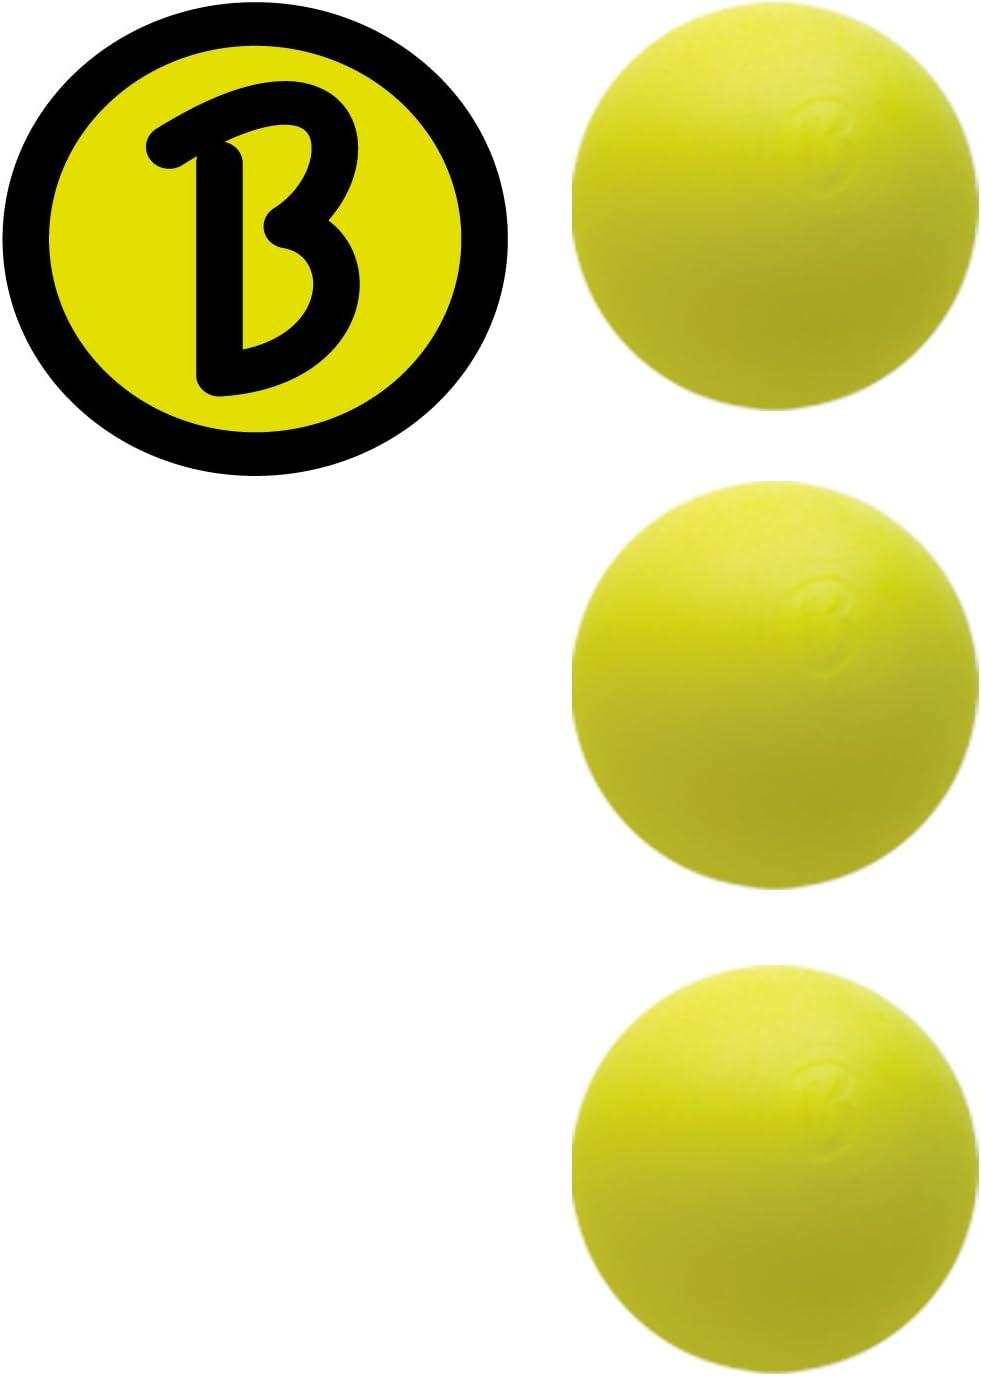 Bärenherz Magic Original - Bola de Futbolín de Torneo Profesional ...